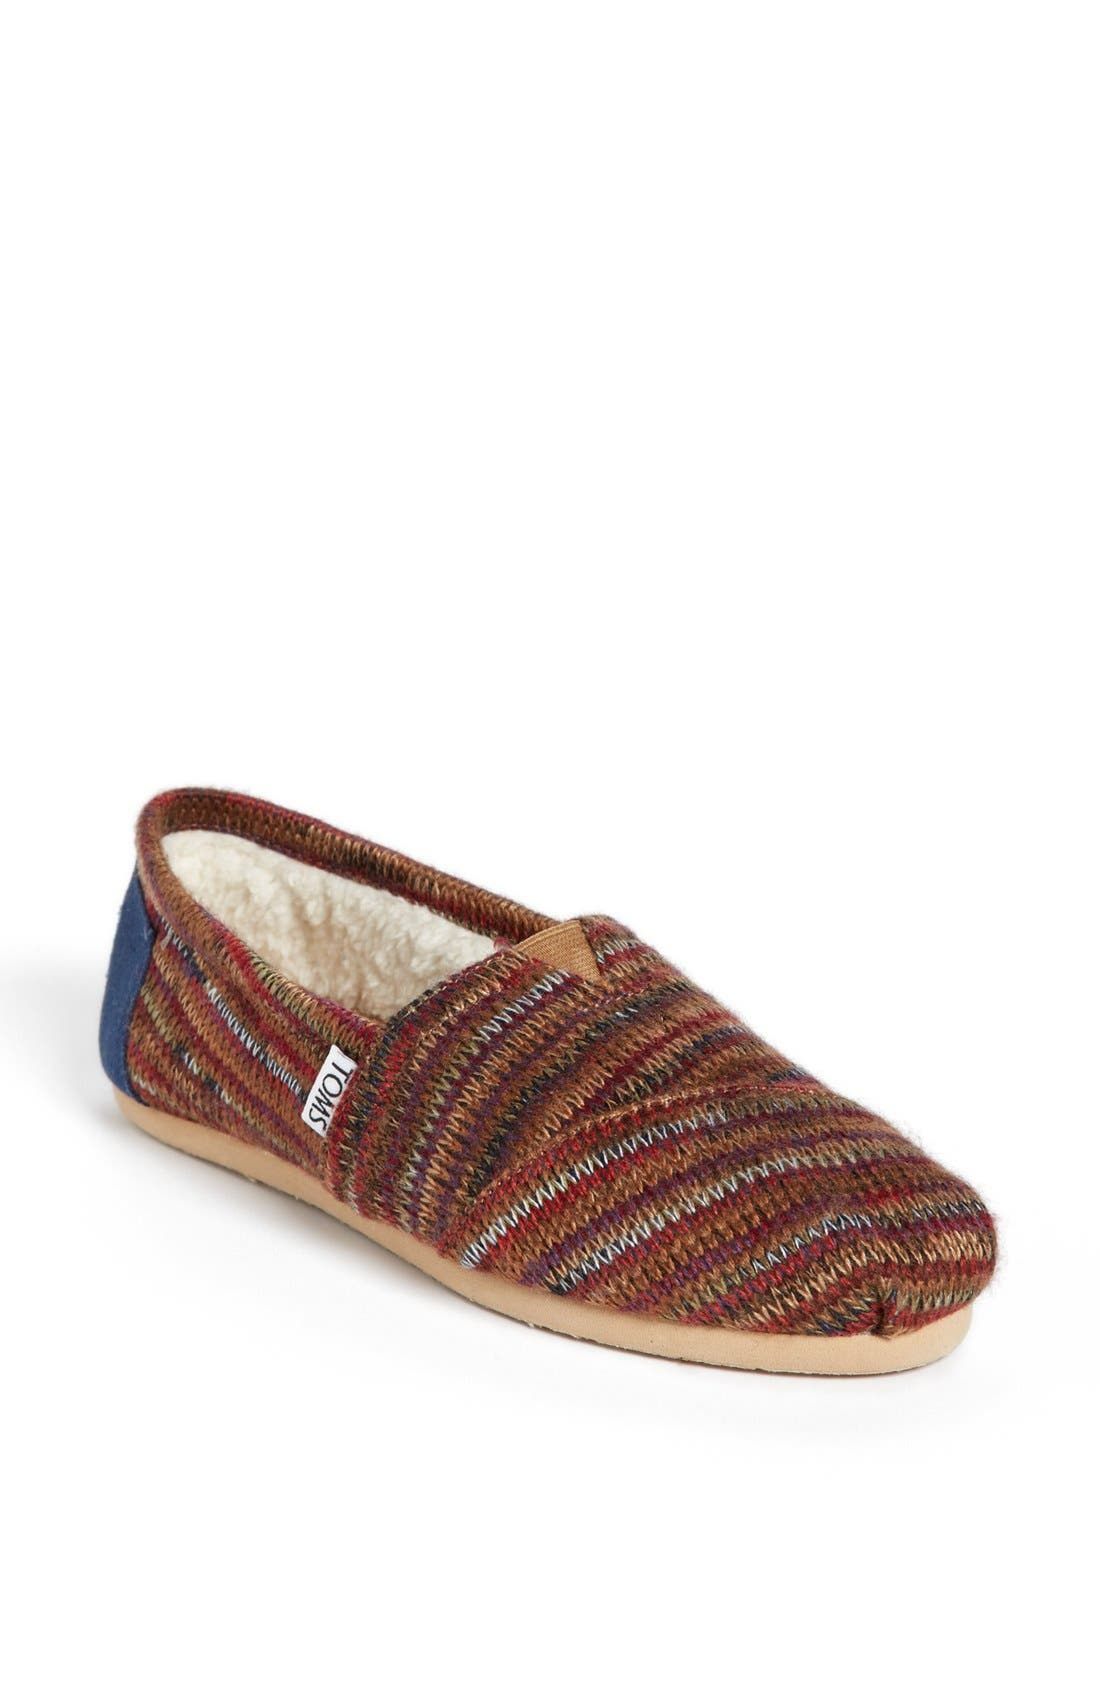 Main Image - TOMS 'Classic - Rust Knit' Slip-On (Women)